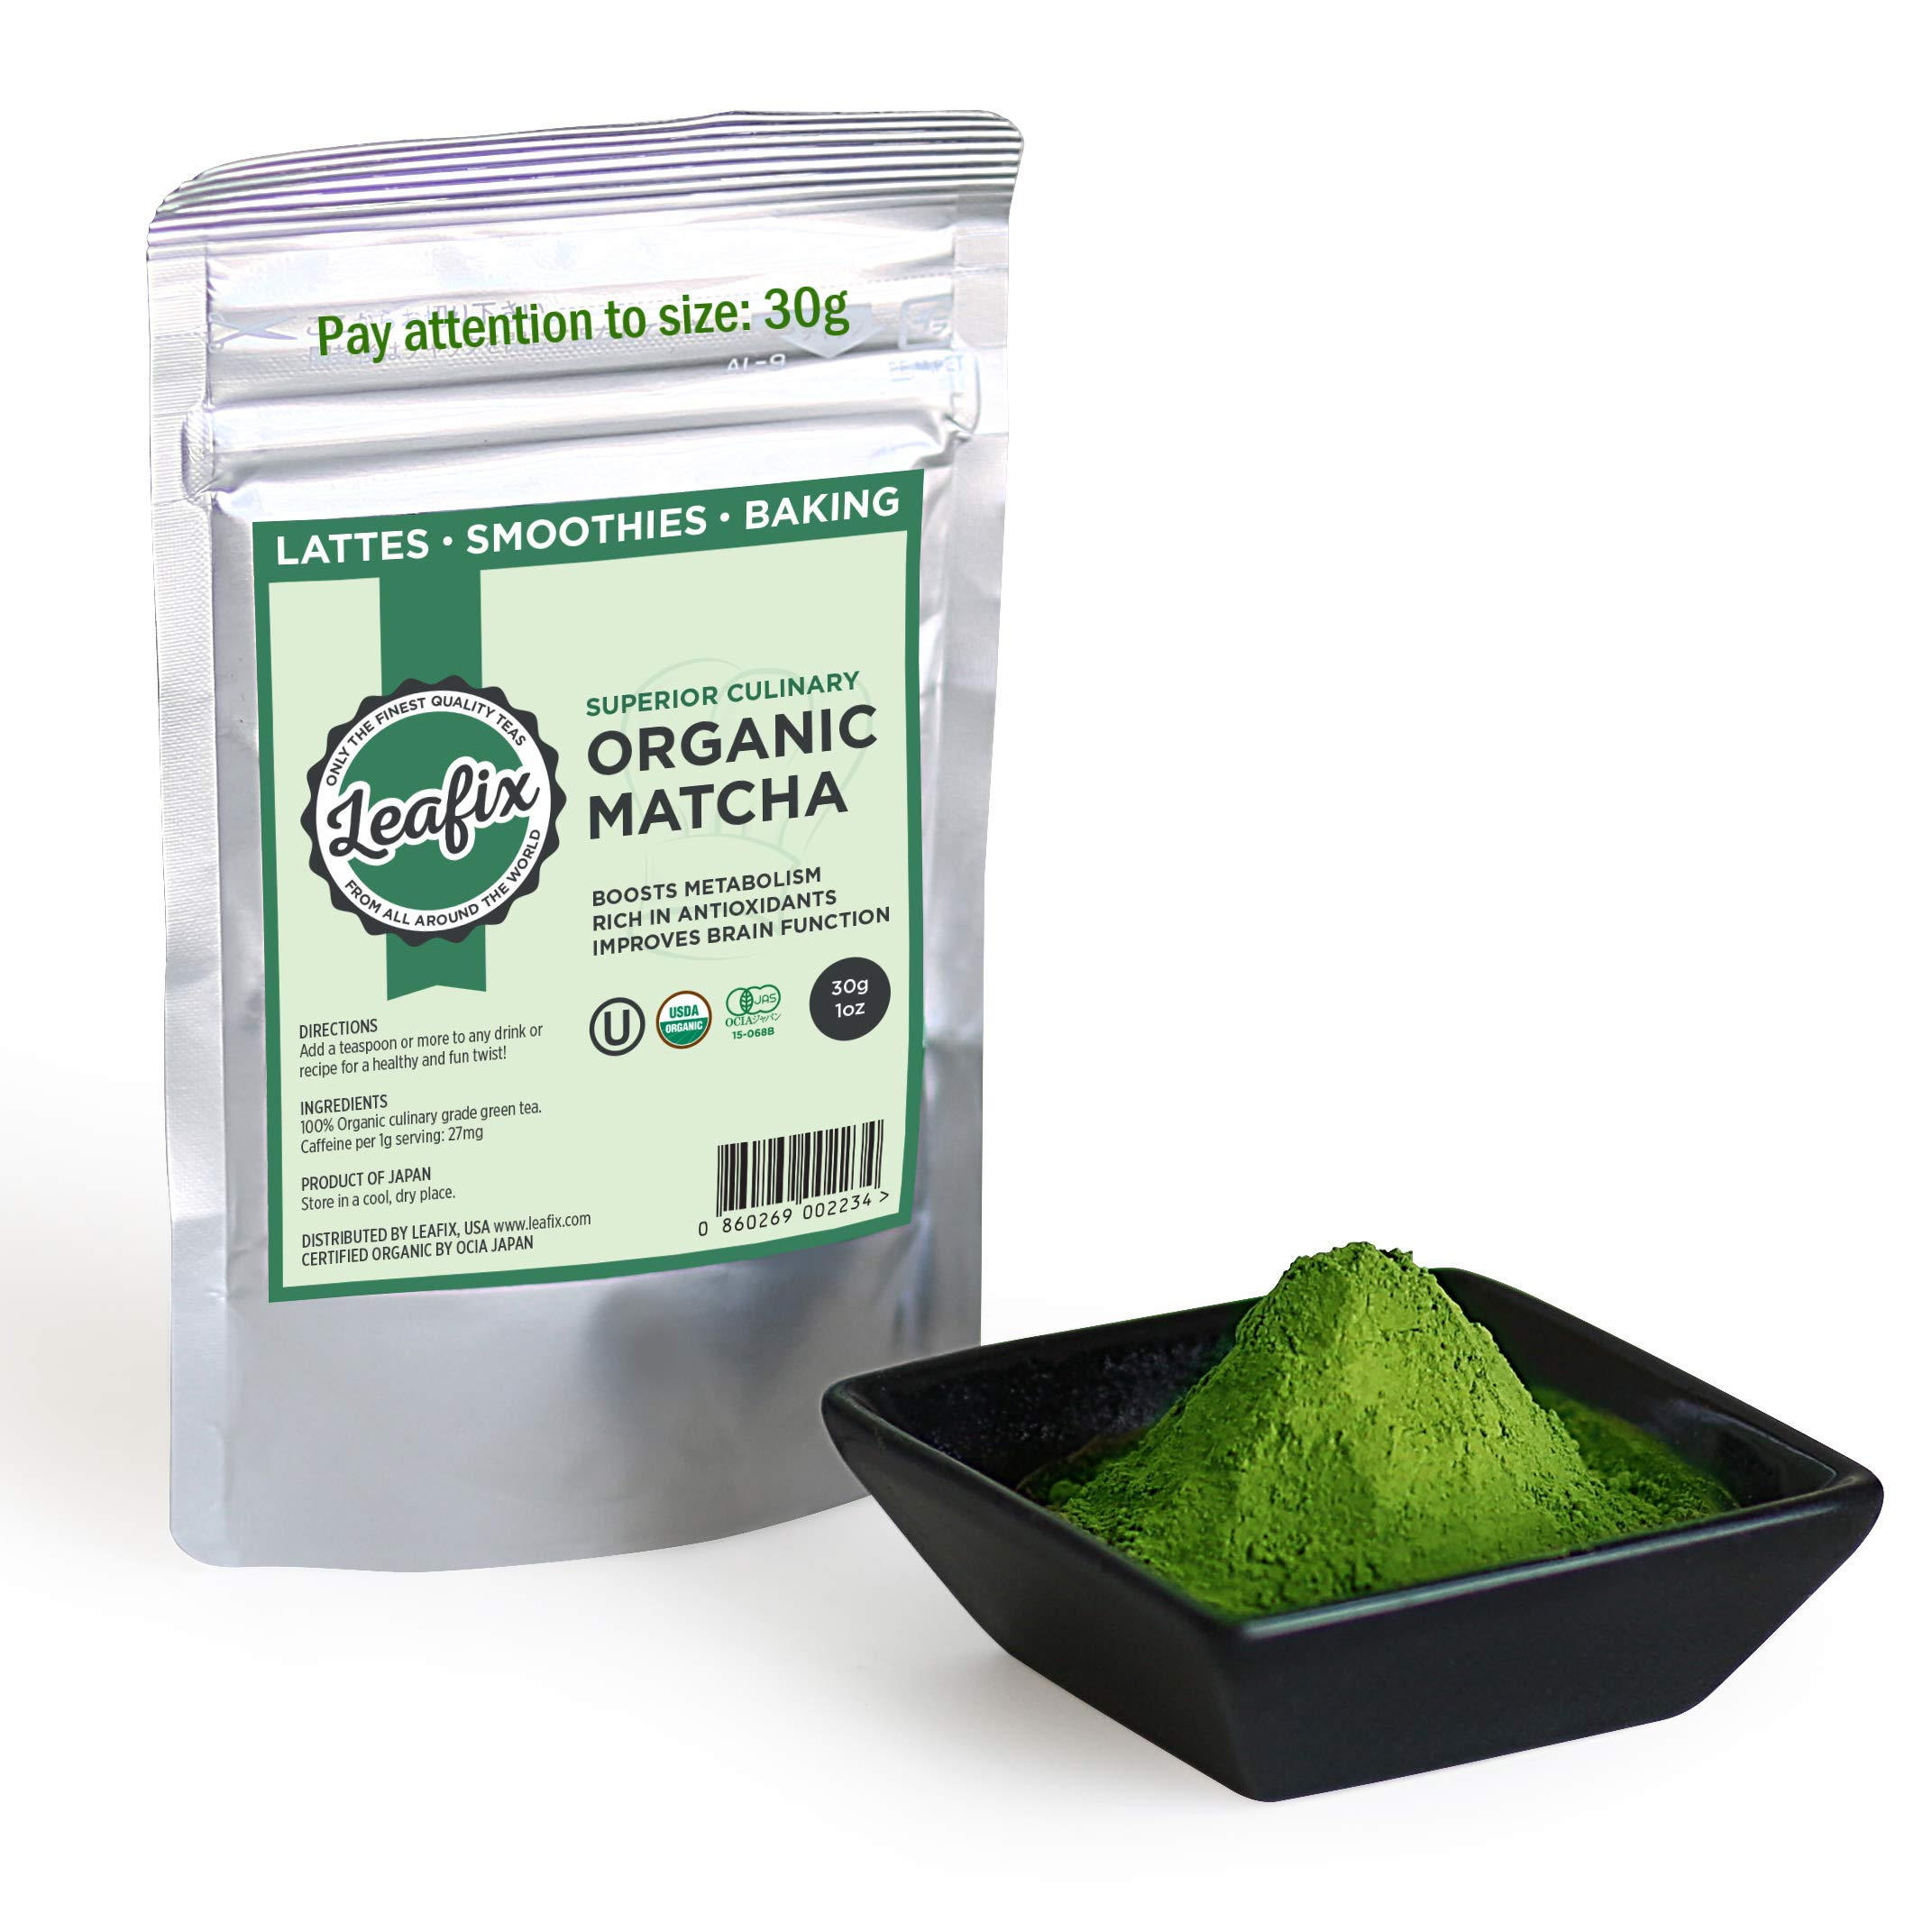 Leafix Matcha Green Tea Powder: Best Japanese Premium Grade Macha Tea   Usda Organic   Superior Quality   Great For Smoothies, Latte, Cooking and Baking   Kosher (Culinary, 30 Gram)